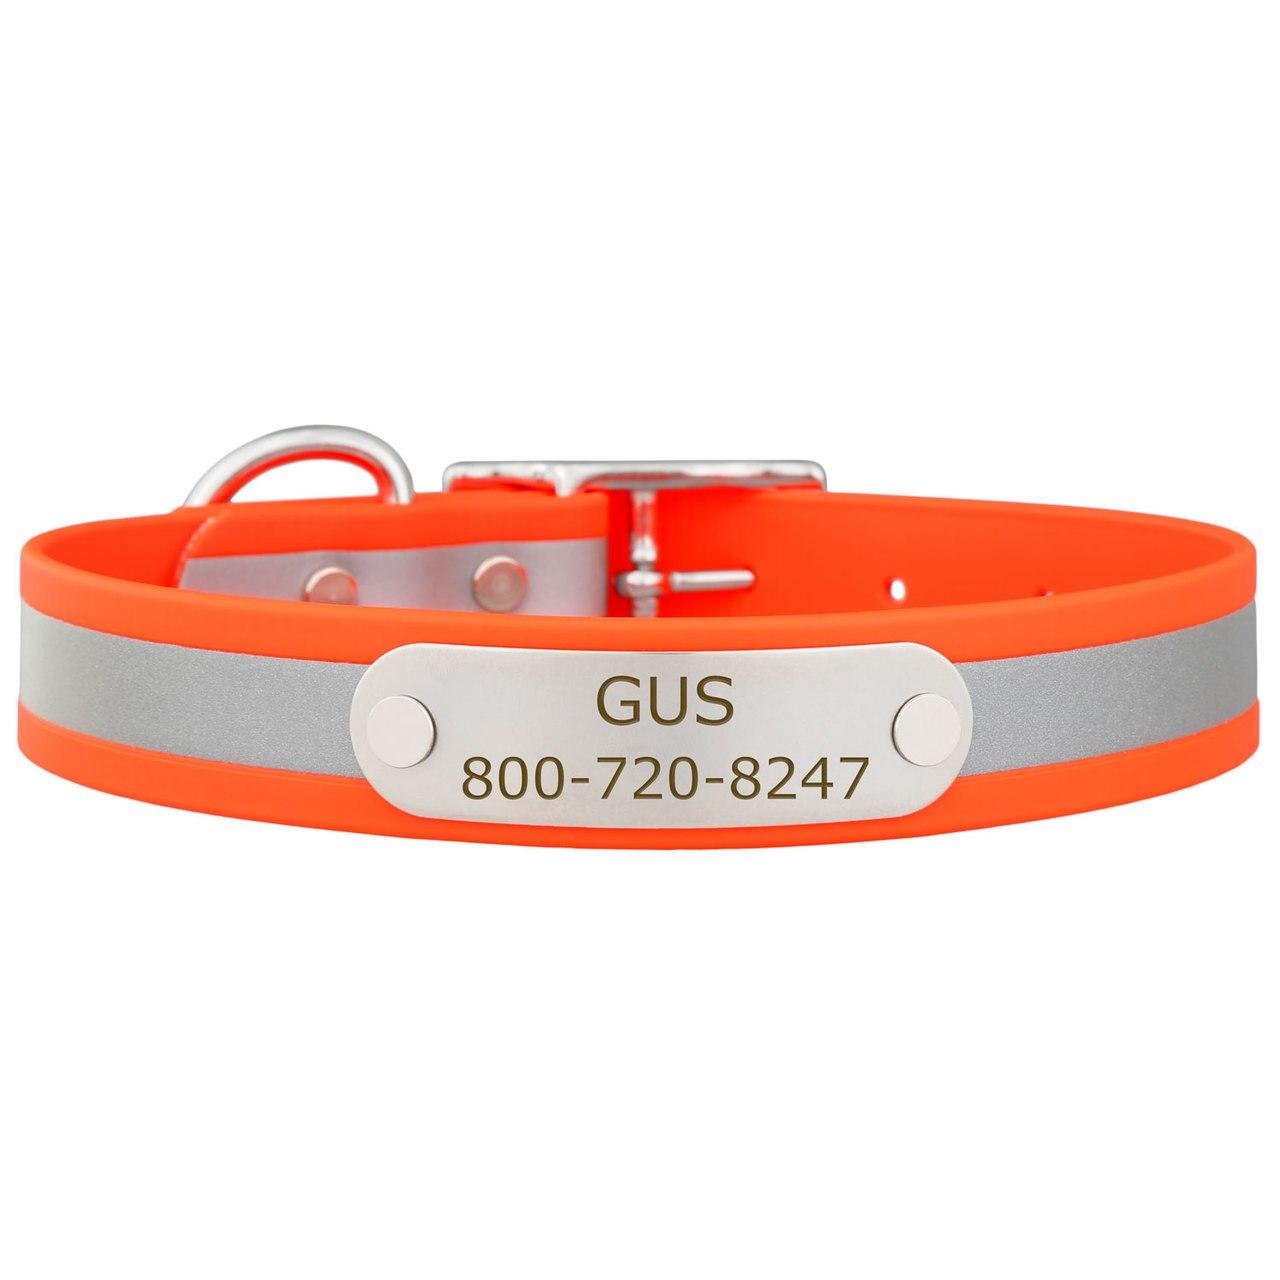 Reflective Waterproof Soft Grip Dog Collar with Nameplate Orange